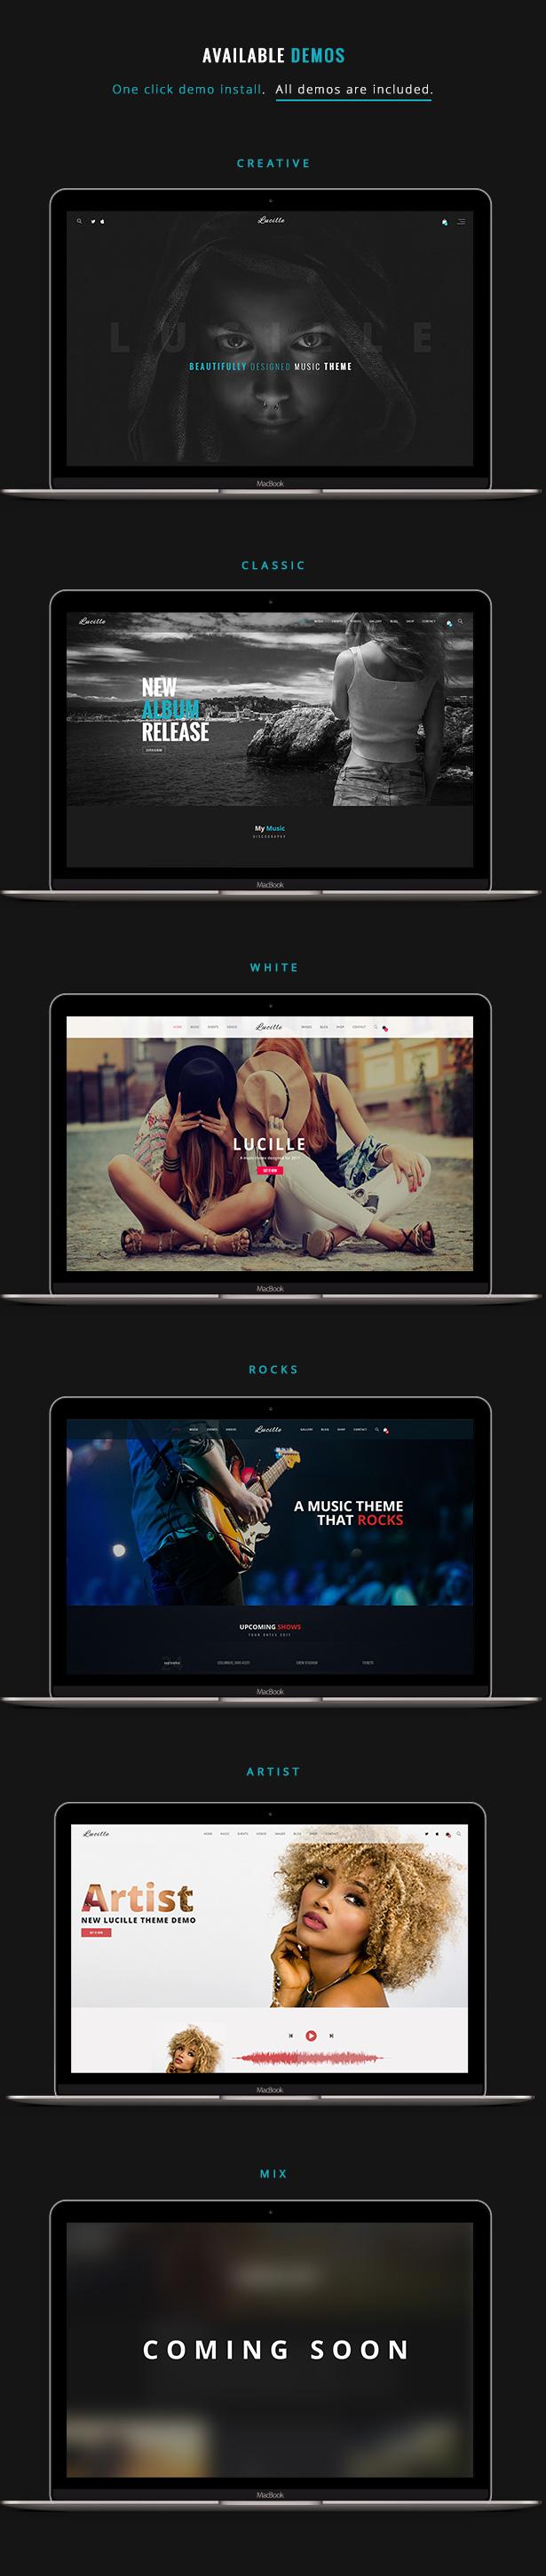 lucille3 - Lucille - Music WordPress Theme